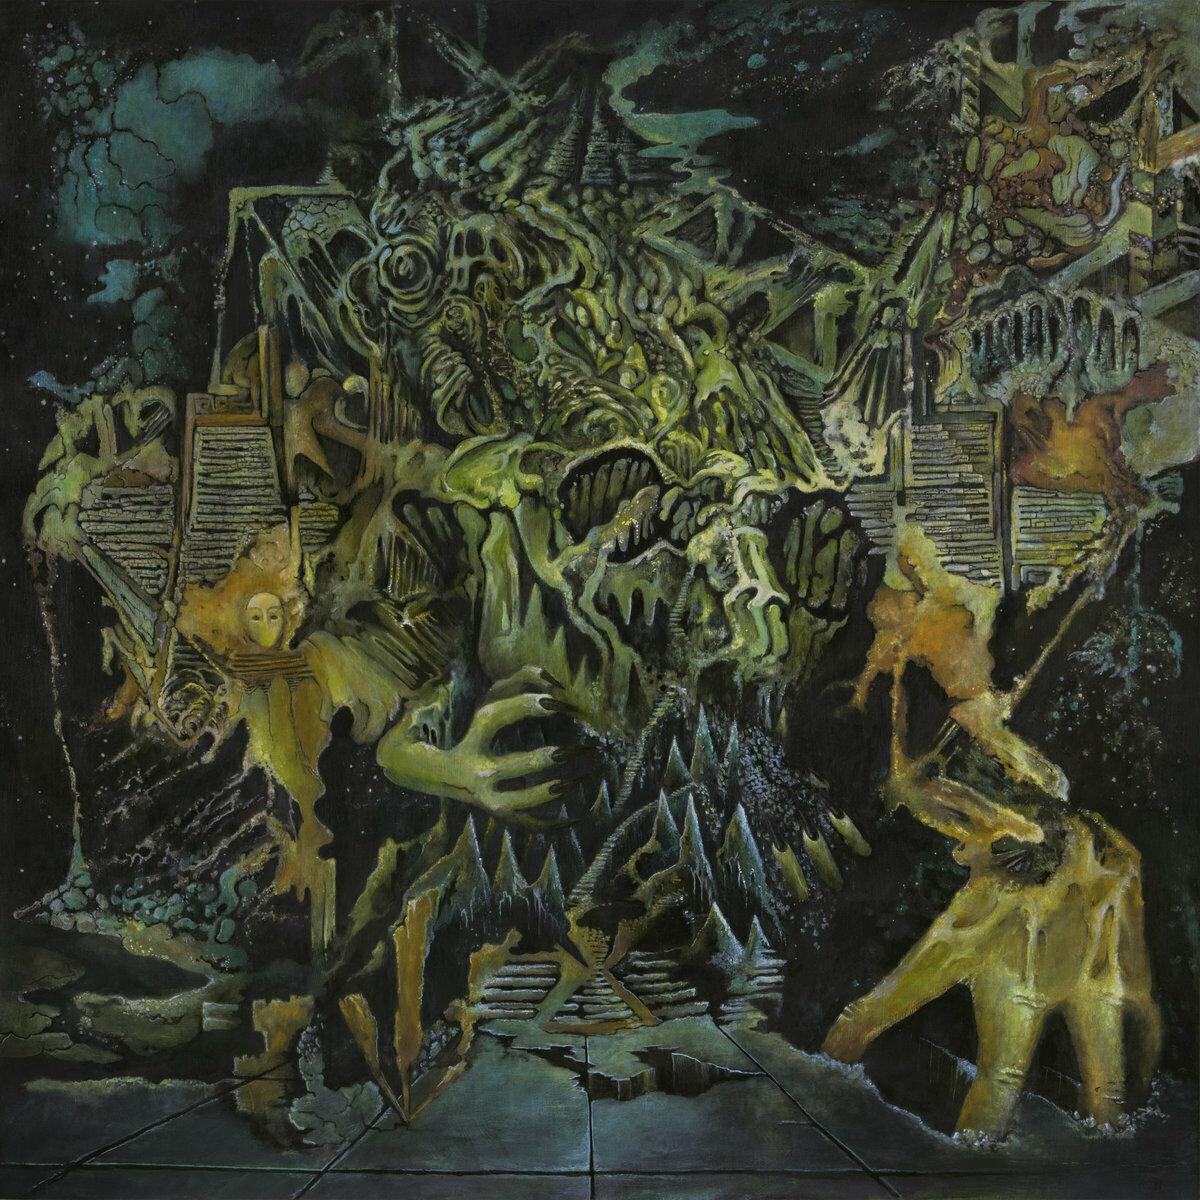 King Gizzard & The Lizard Wizard - Murder Of The Universe [LP]